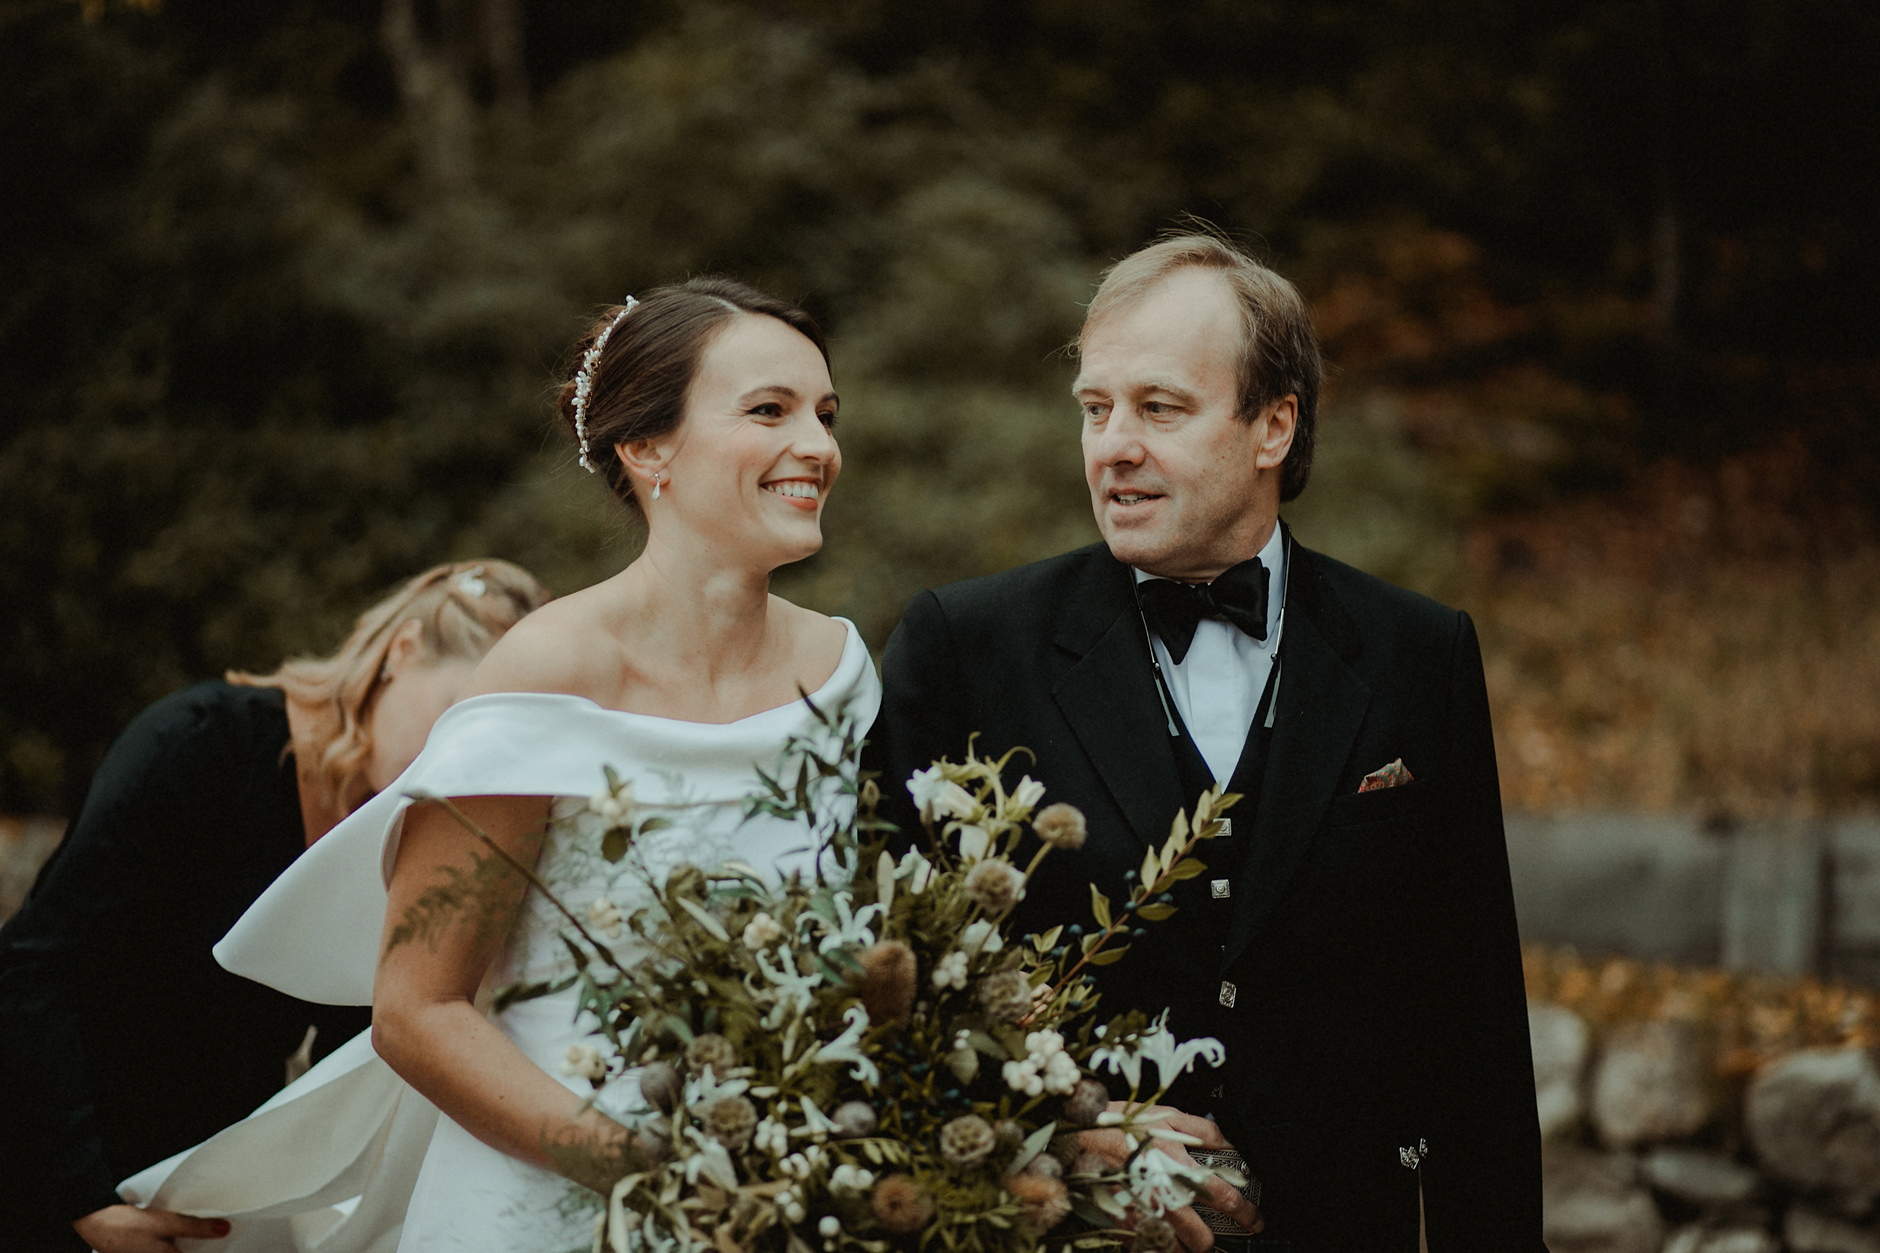 Glentruim-Wedding-Nikki-Leadbetter-Photography-82.jpg